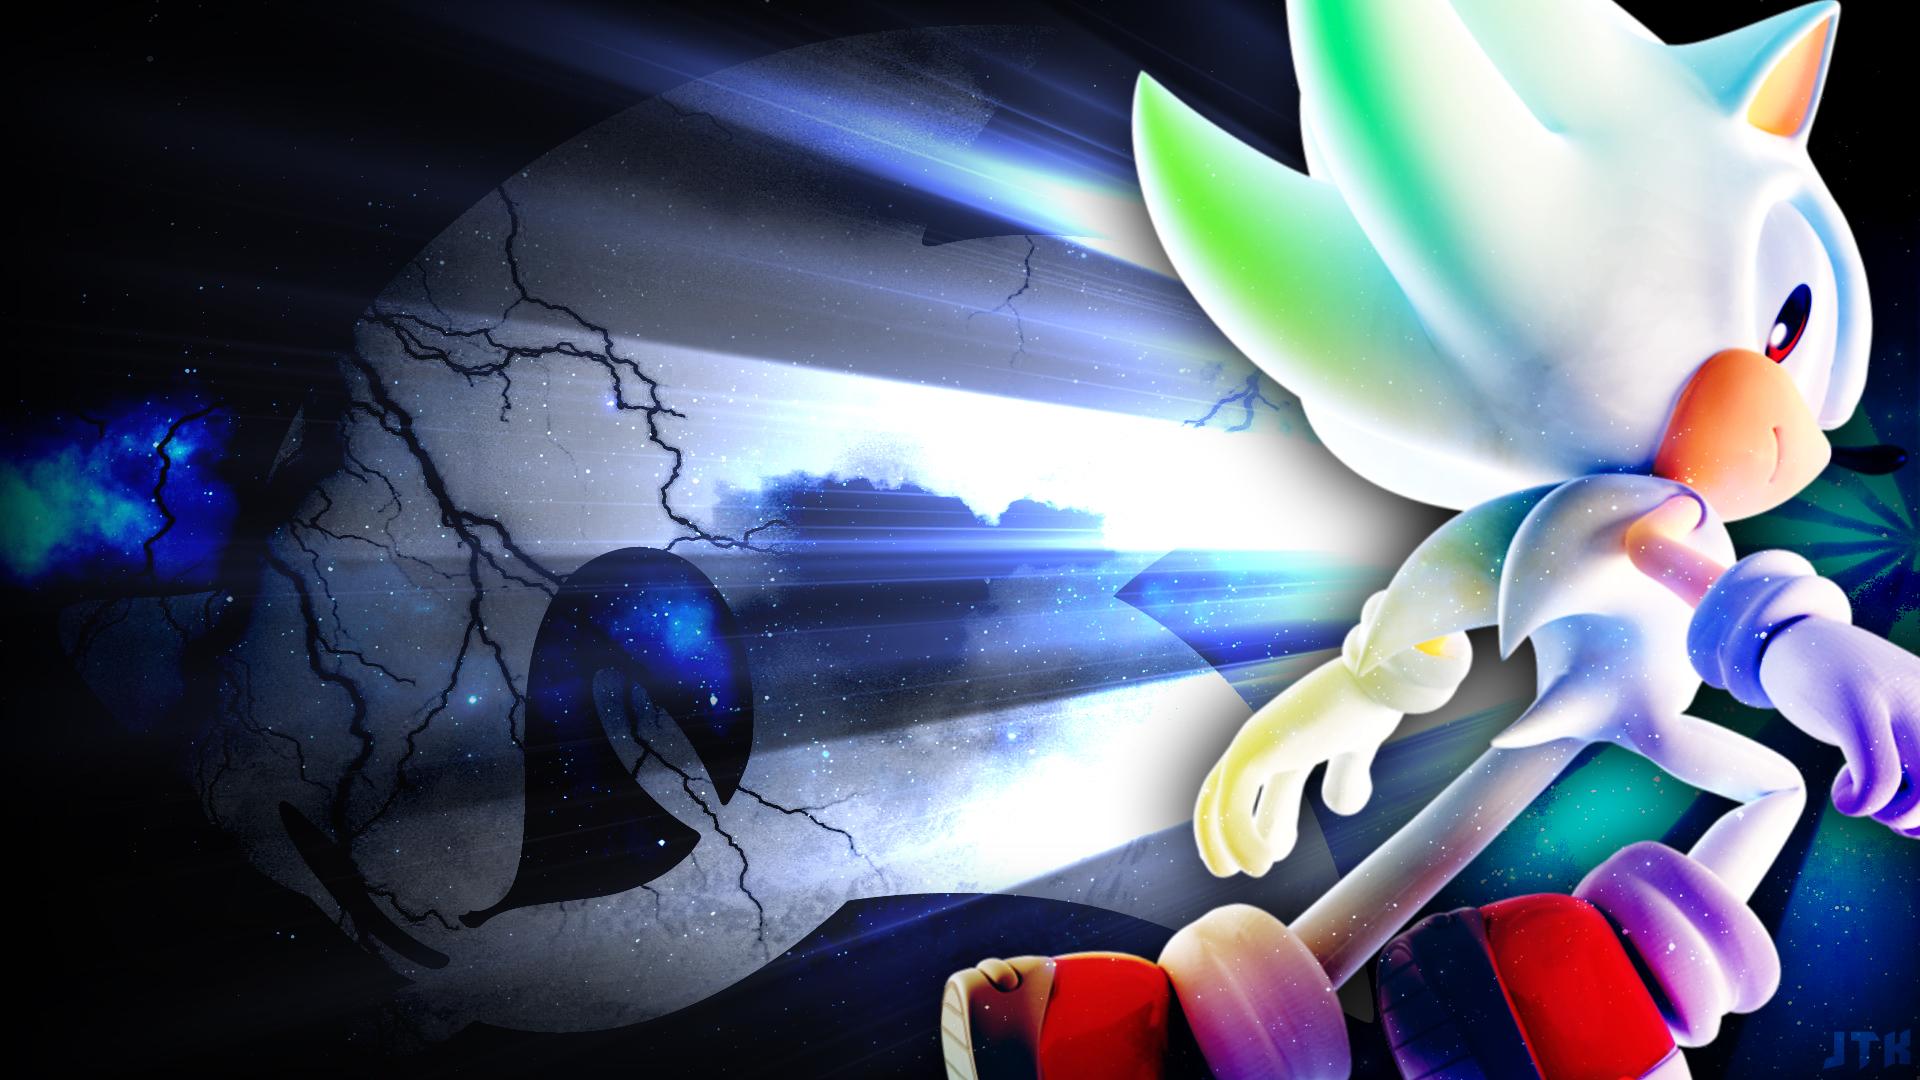 Hyper Sonic Wallpaper By Jacktheknight On Deviantart